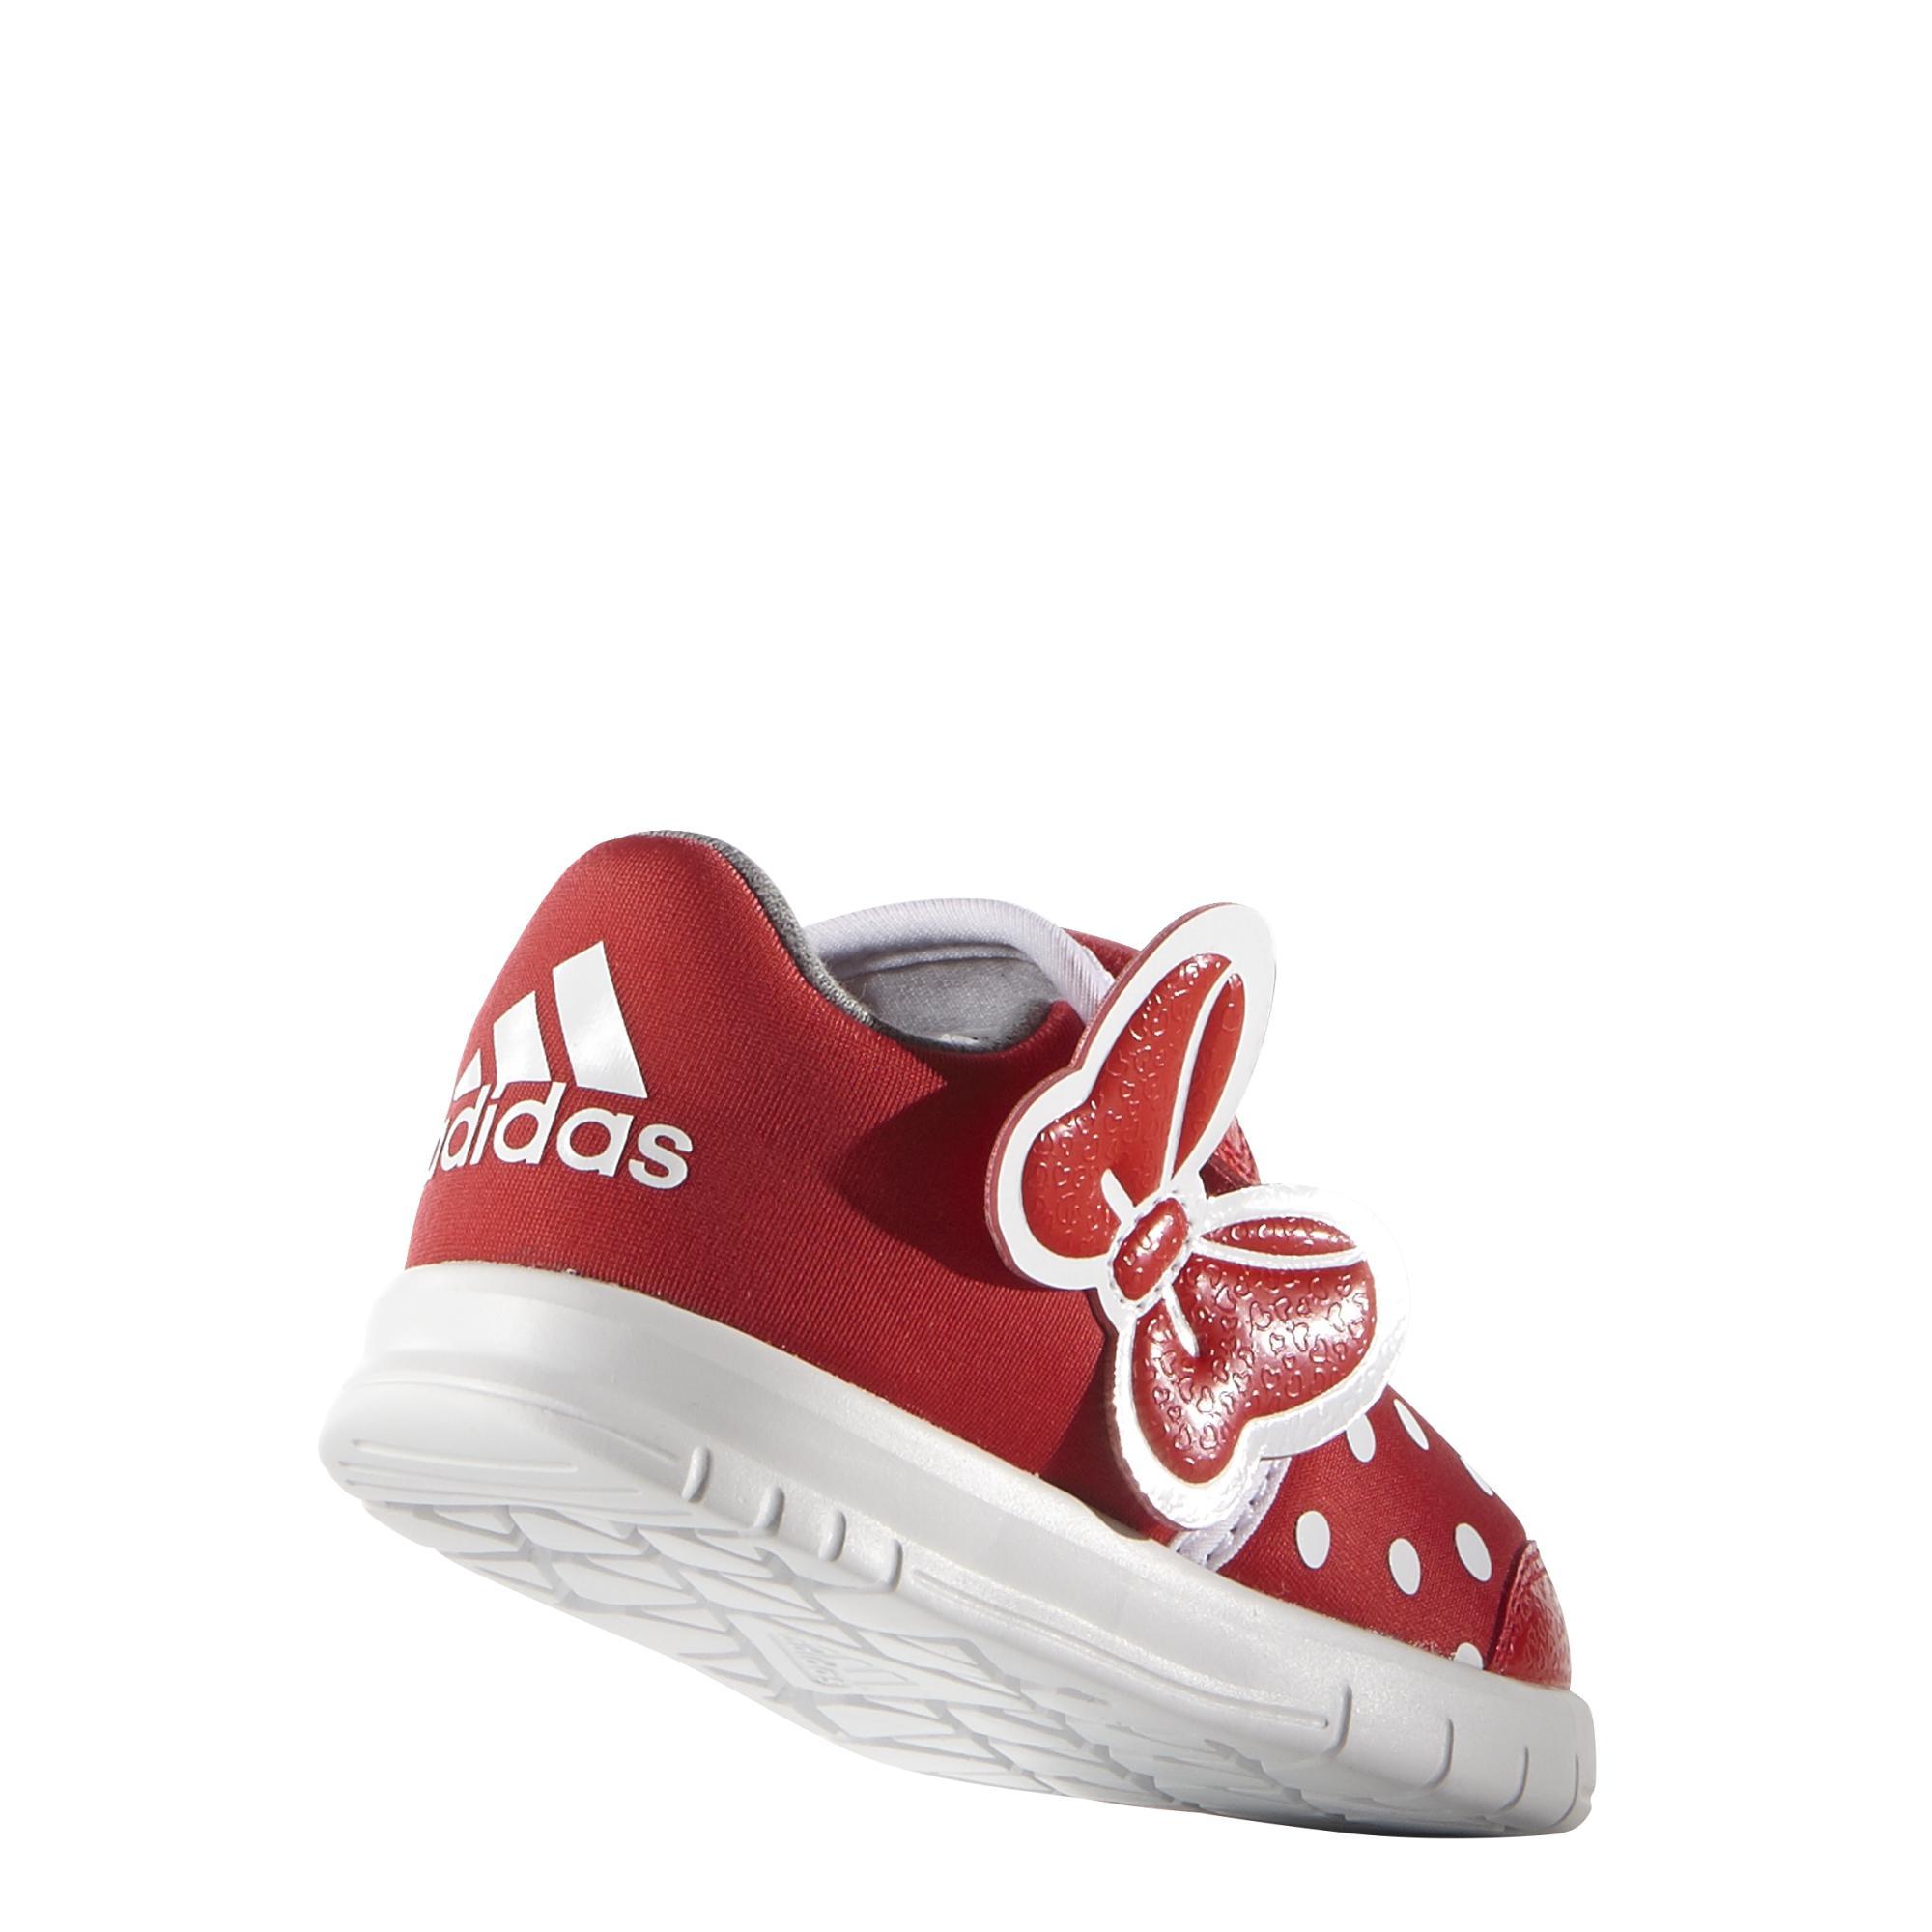 Adidas Disney Zapatillas Zapatillas Nina Nina Adidas Zapatillas Nina Disney Zapatillas Disney Nina Adidas Adidas Pn0Ok8w